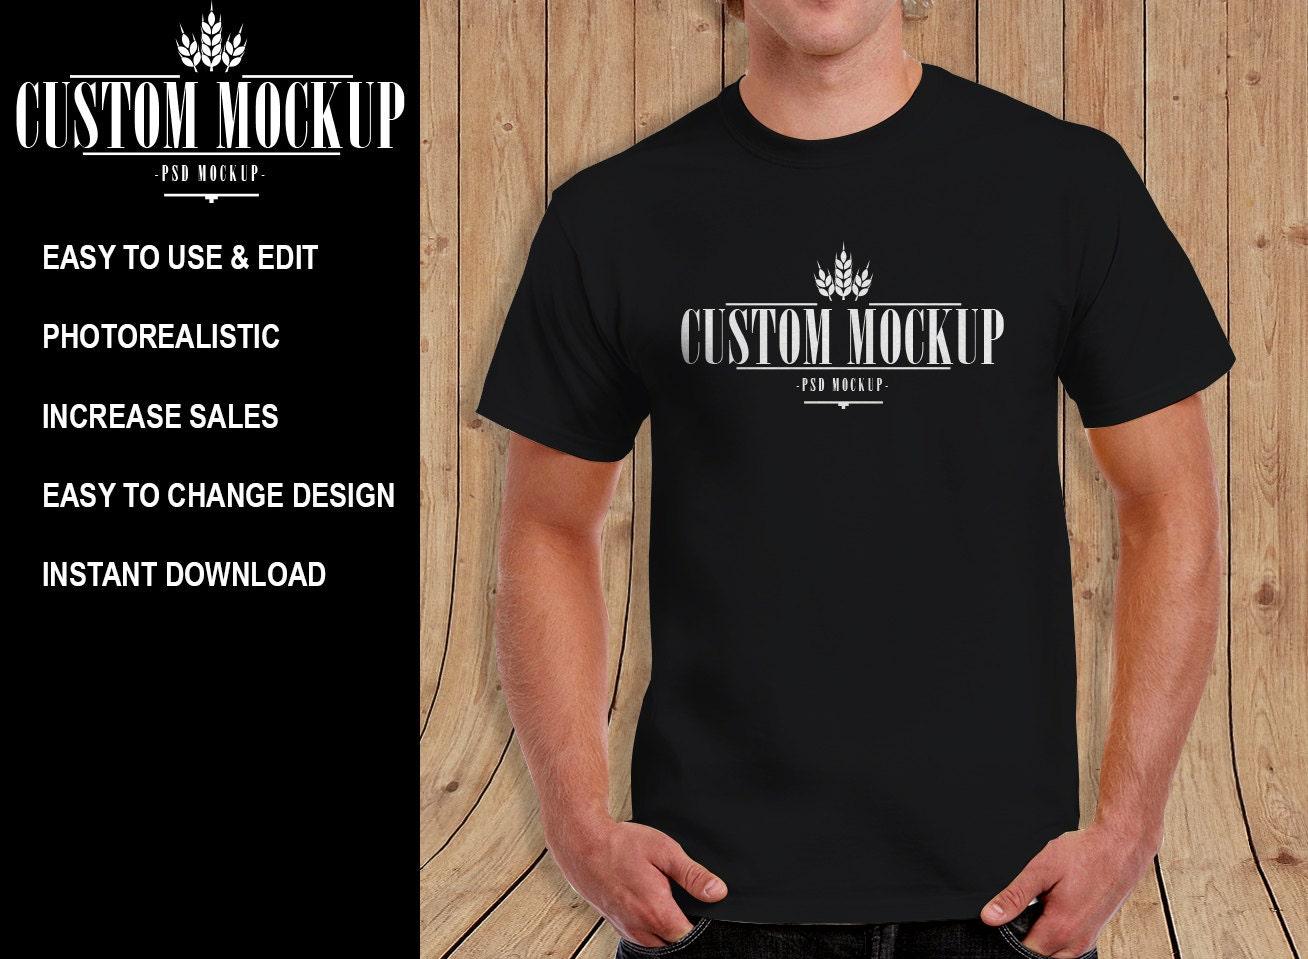 gildan 2000 tshirt mock up template unlimited color